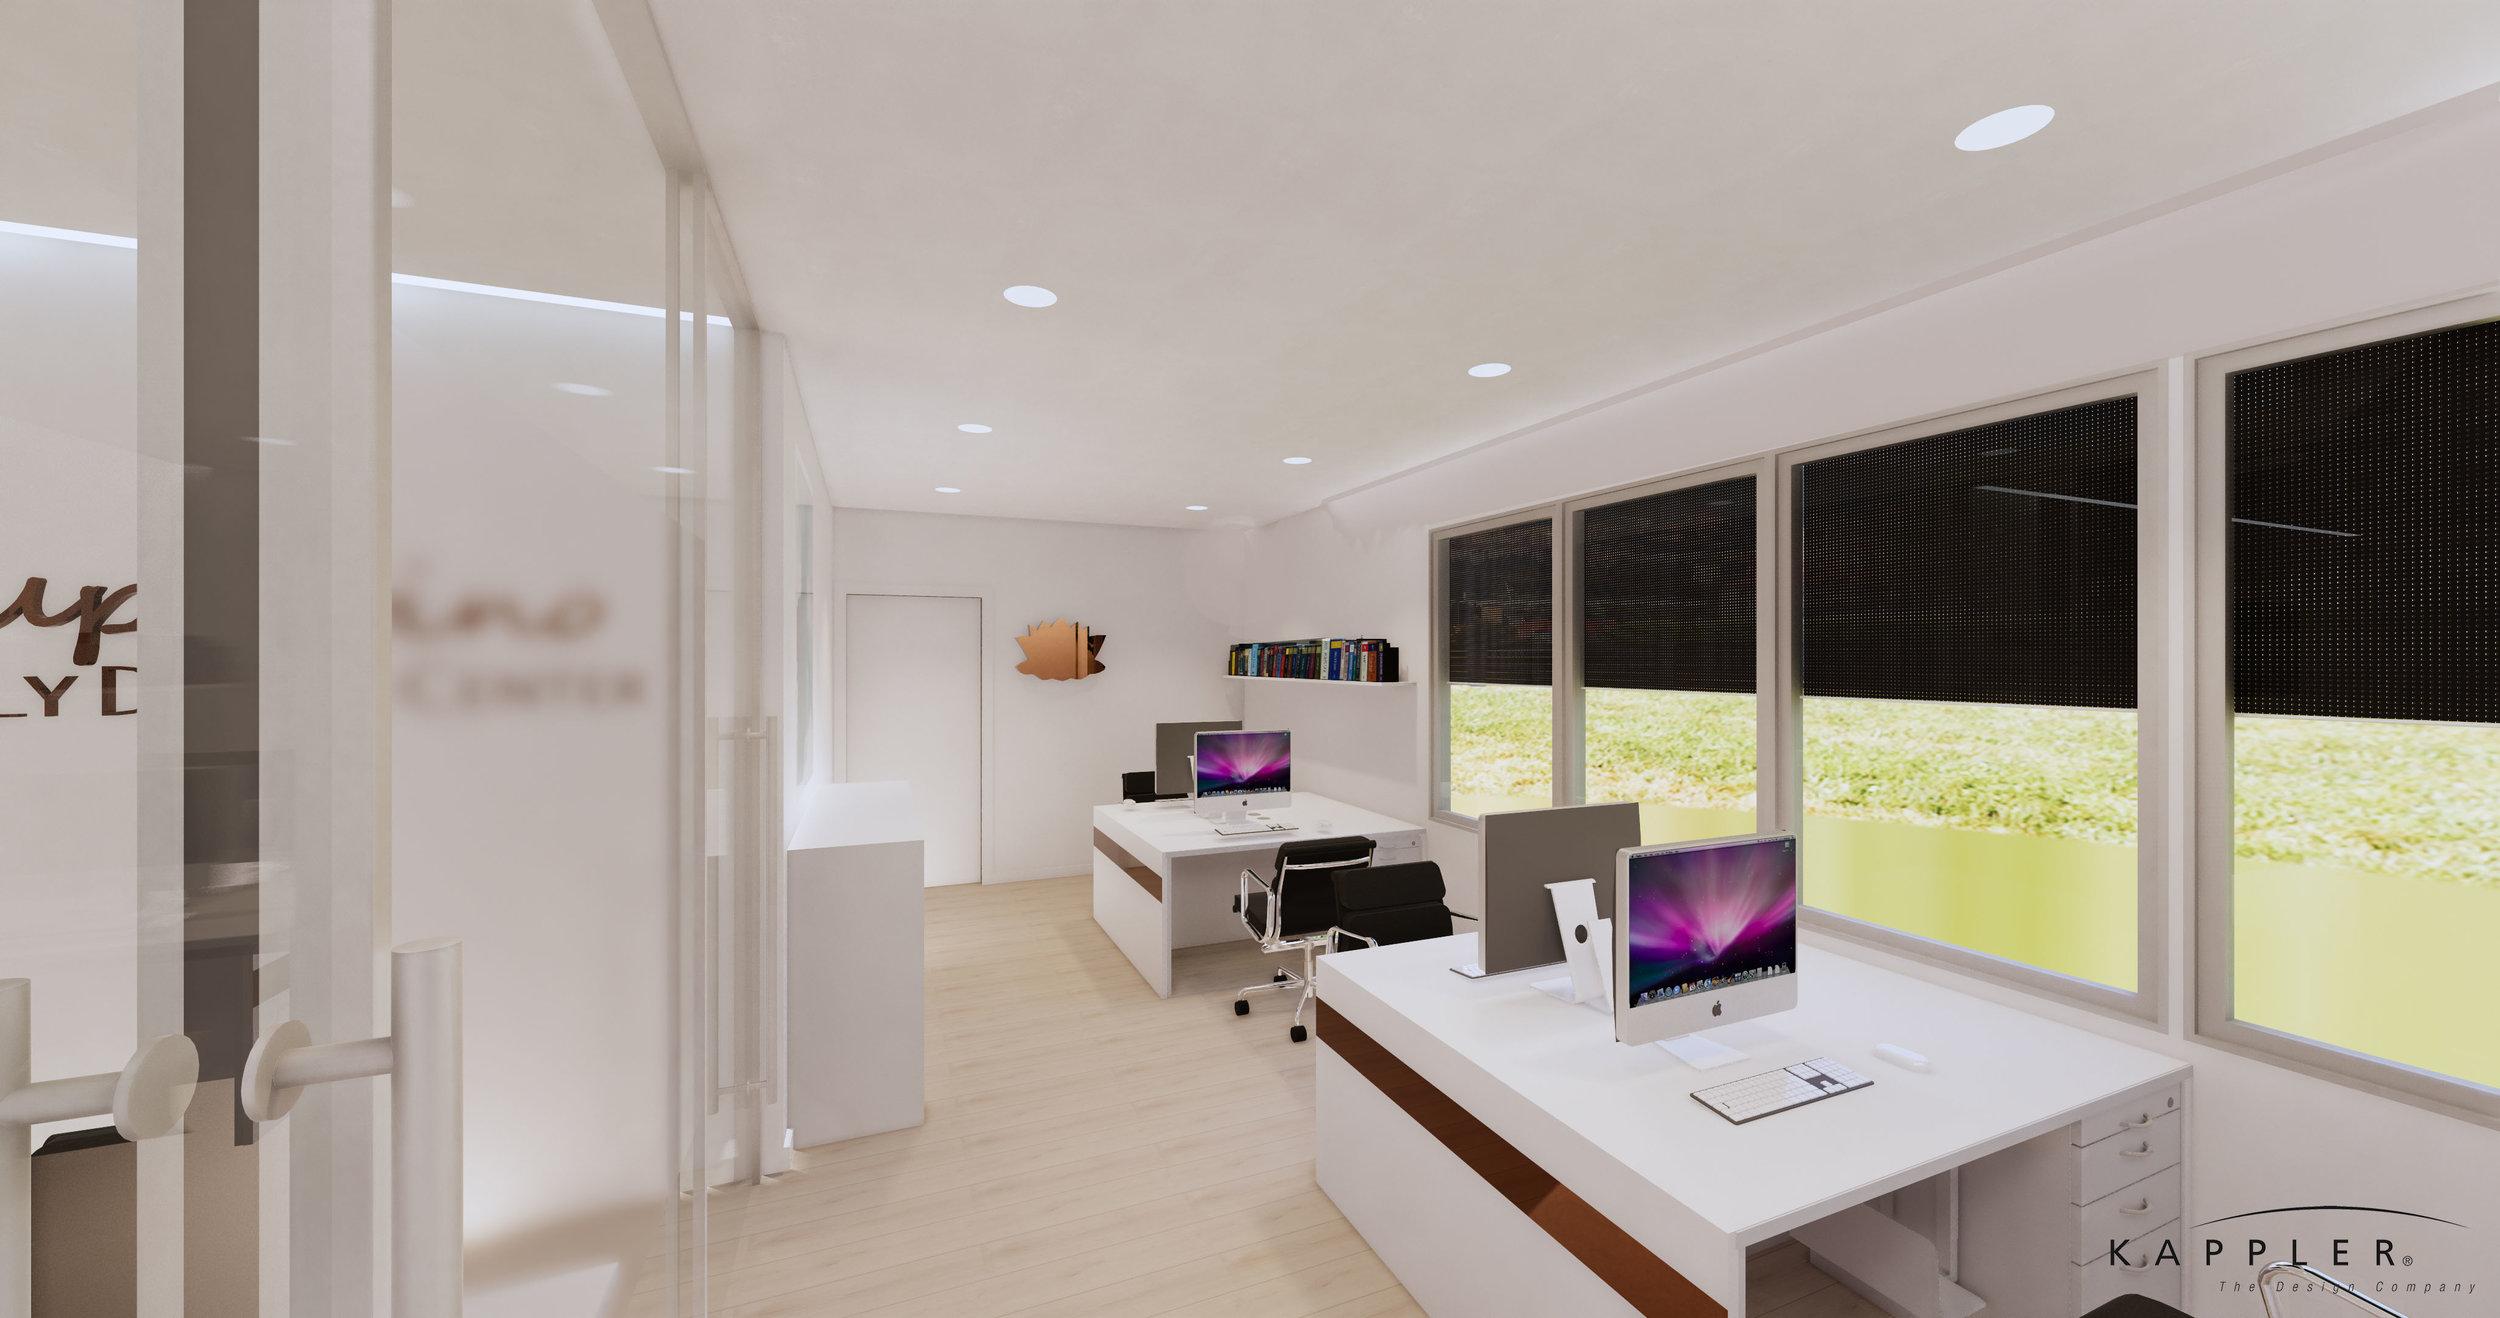 Nordic design dental office space in california